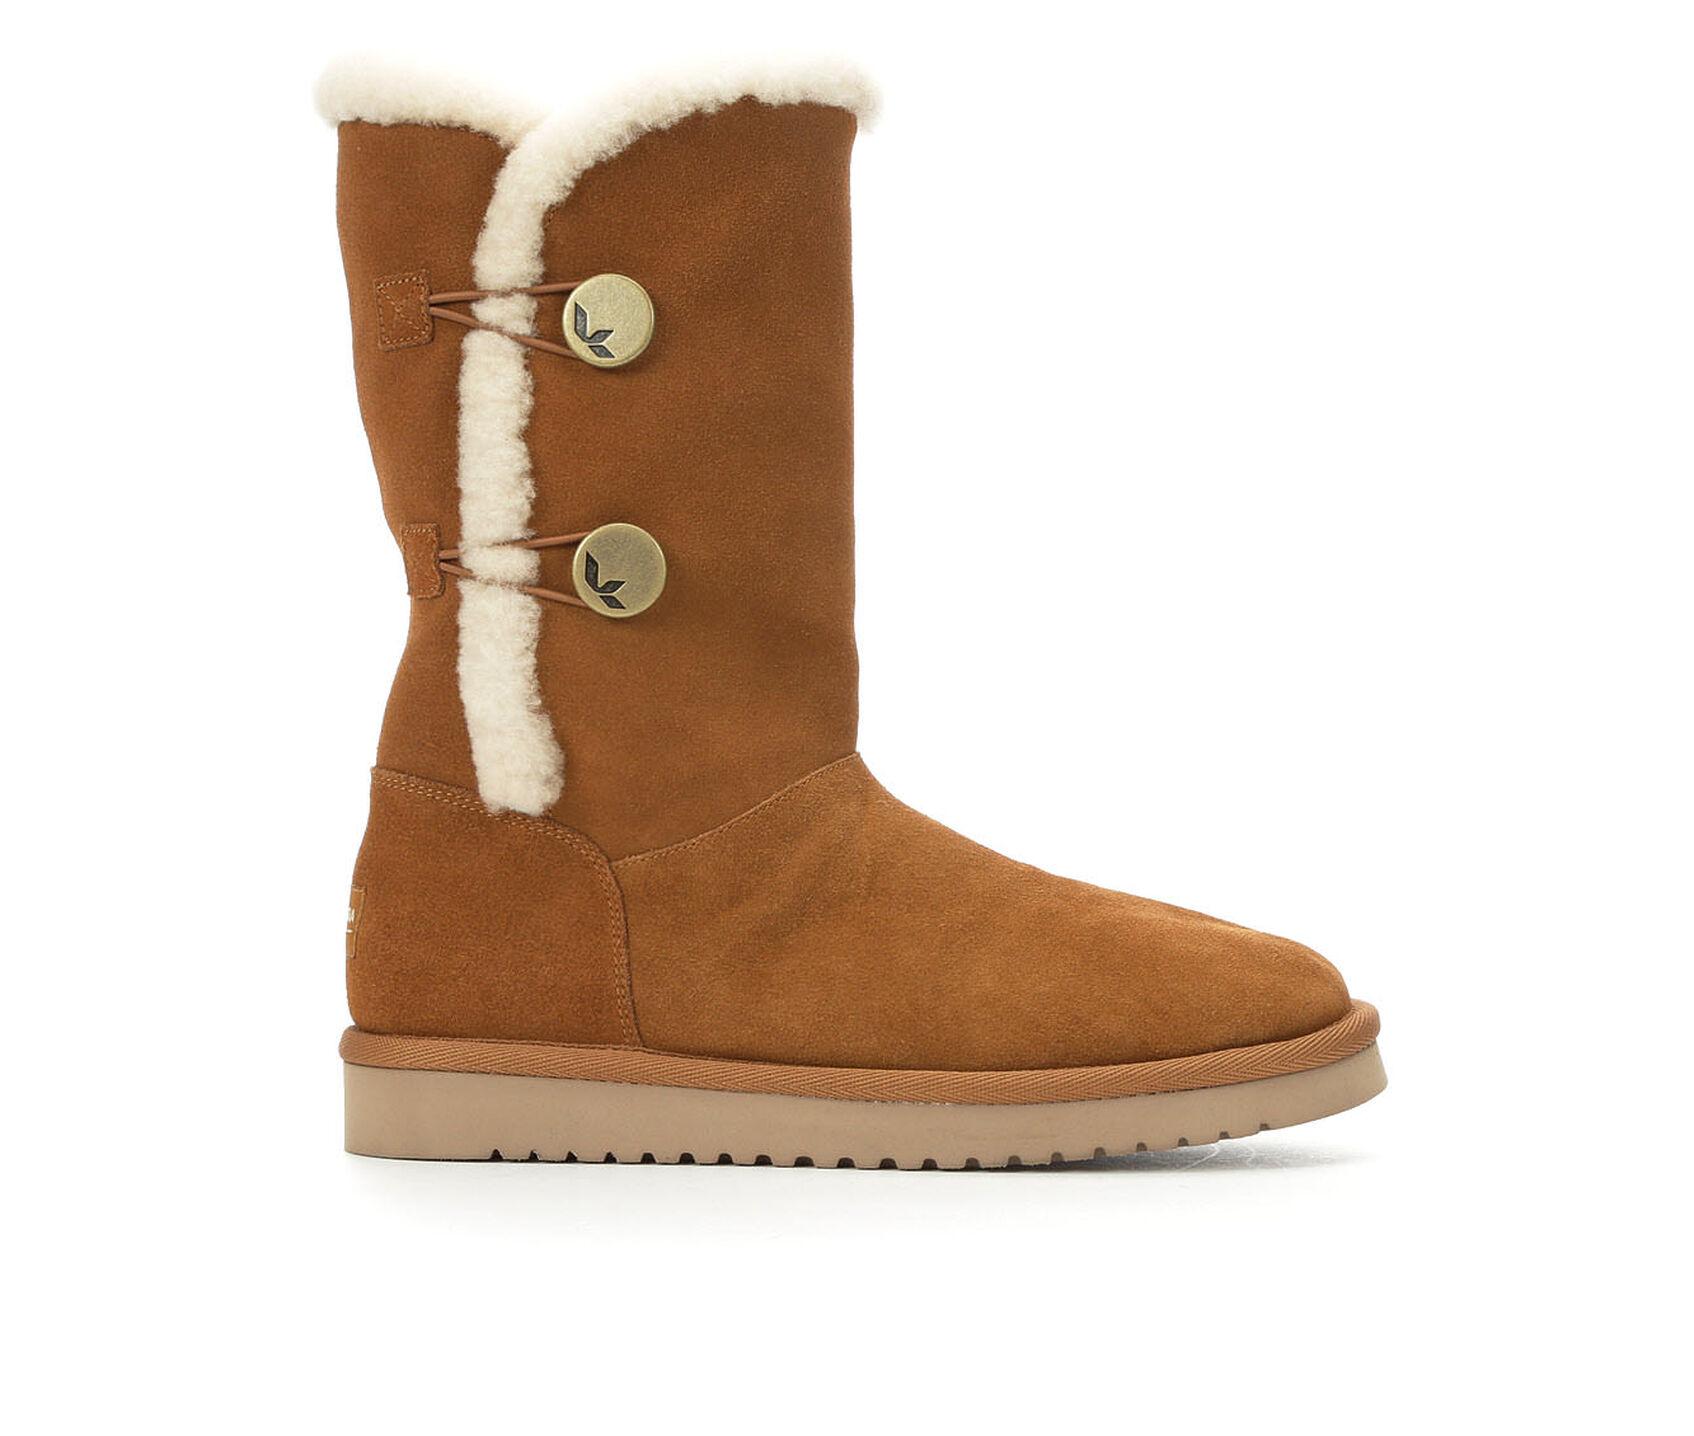 2243b0647ef Women's Koolaburra by UGG Kinslei Tall Boots